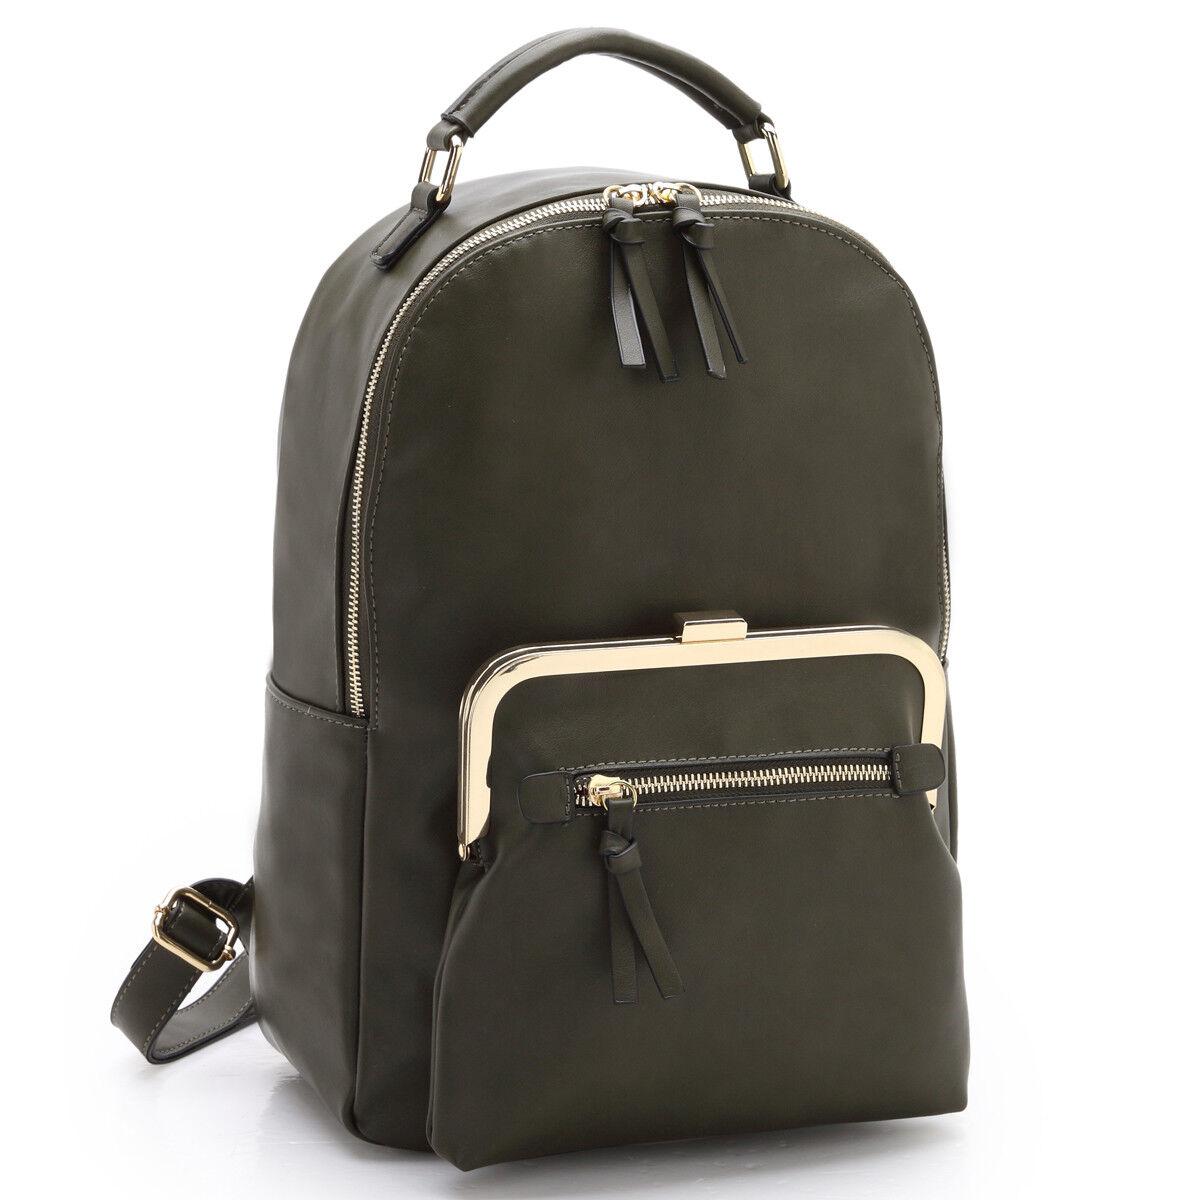 new women handbag faux leather backpack rucksack